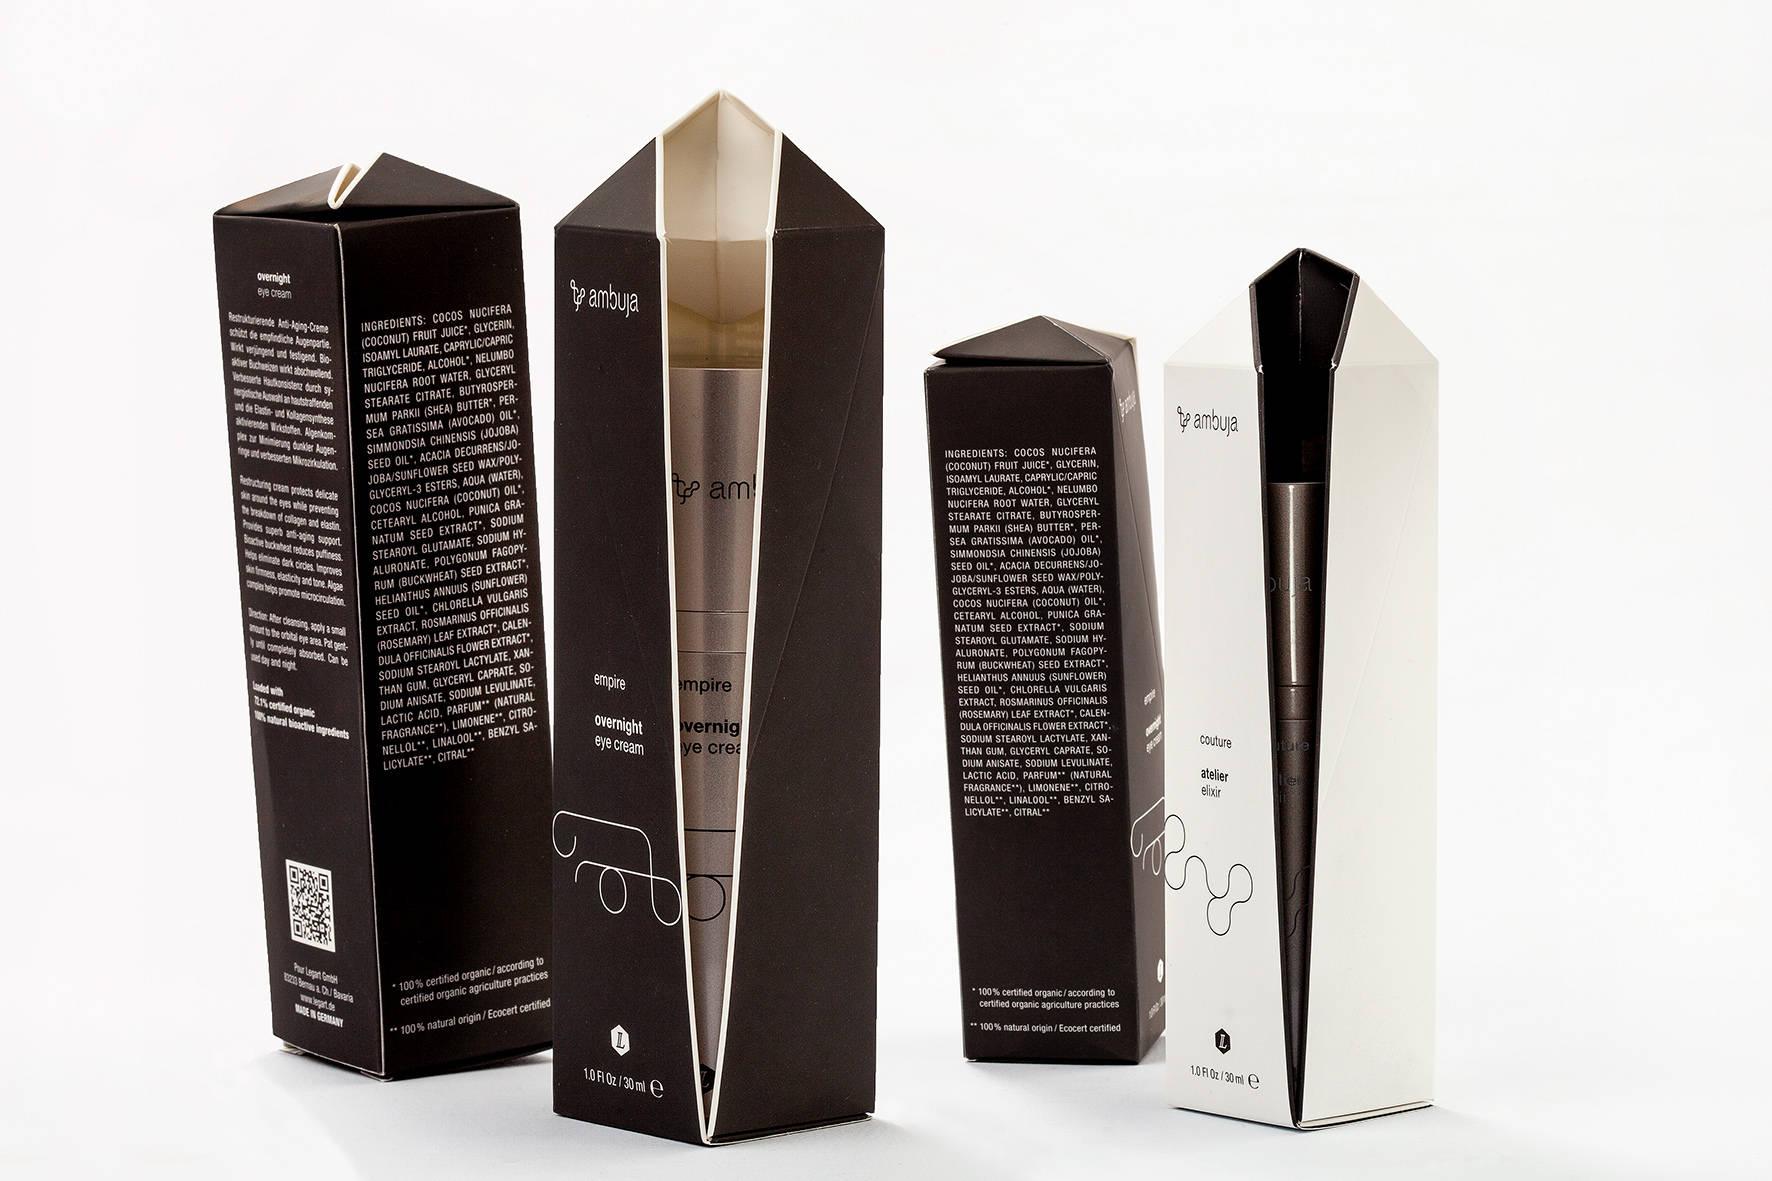 carton-award-image 113610